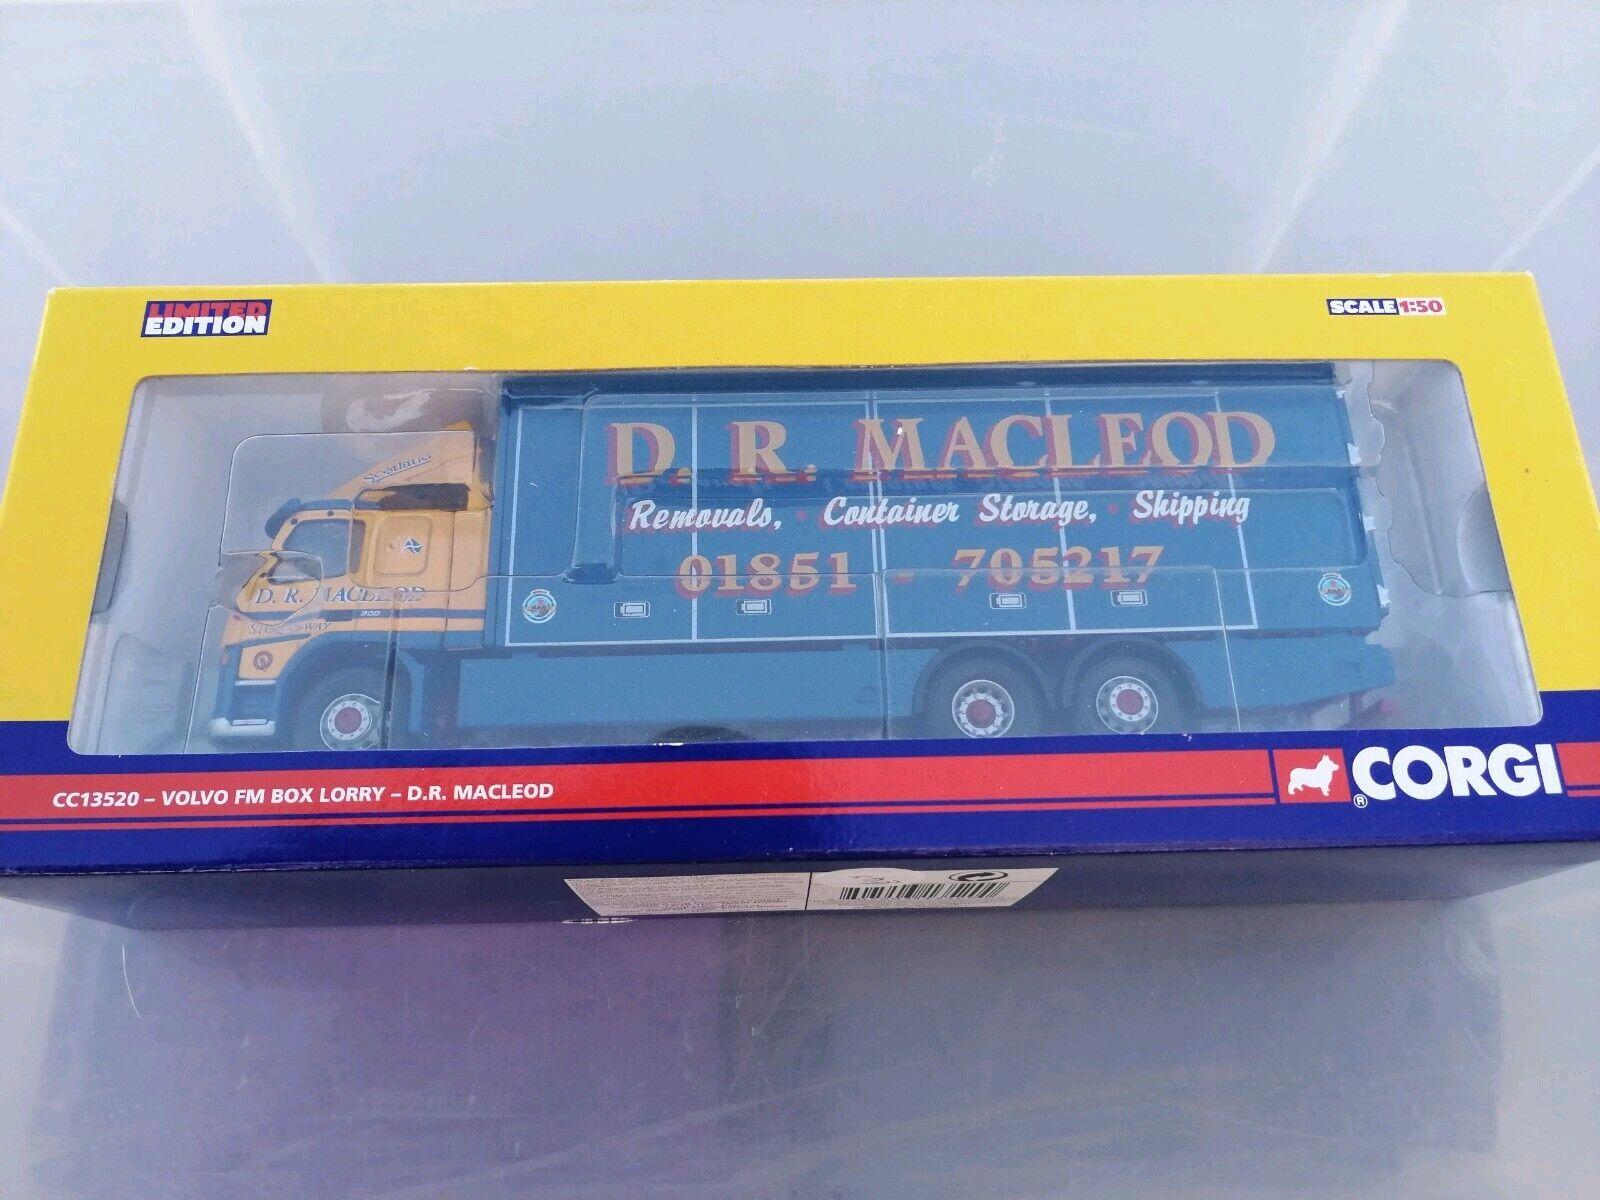 Corgi cc13520 Volvo fm box lorry D, R, MACLEOD